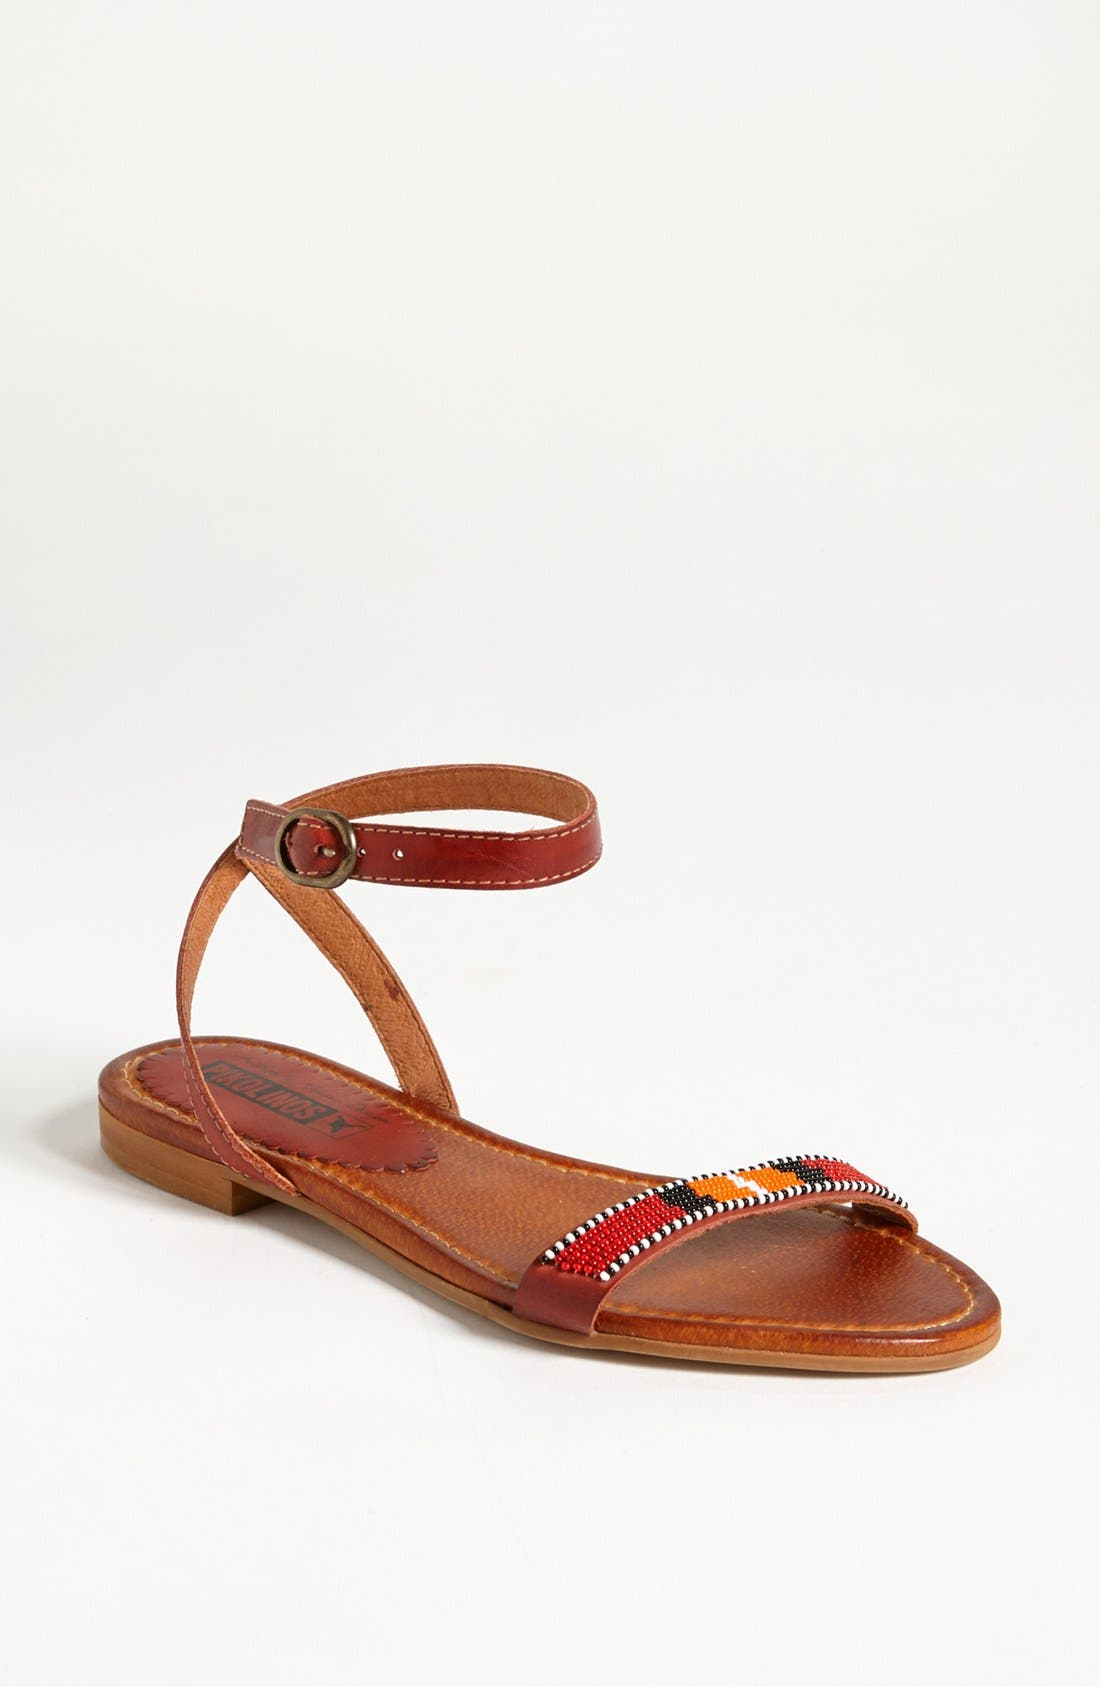 Main Image - PIKOLINOS 'Formentera' Sandal